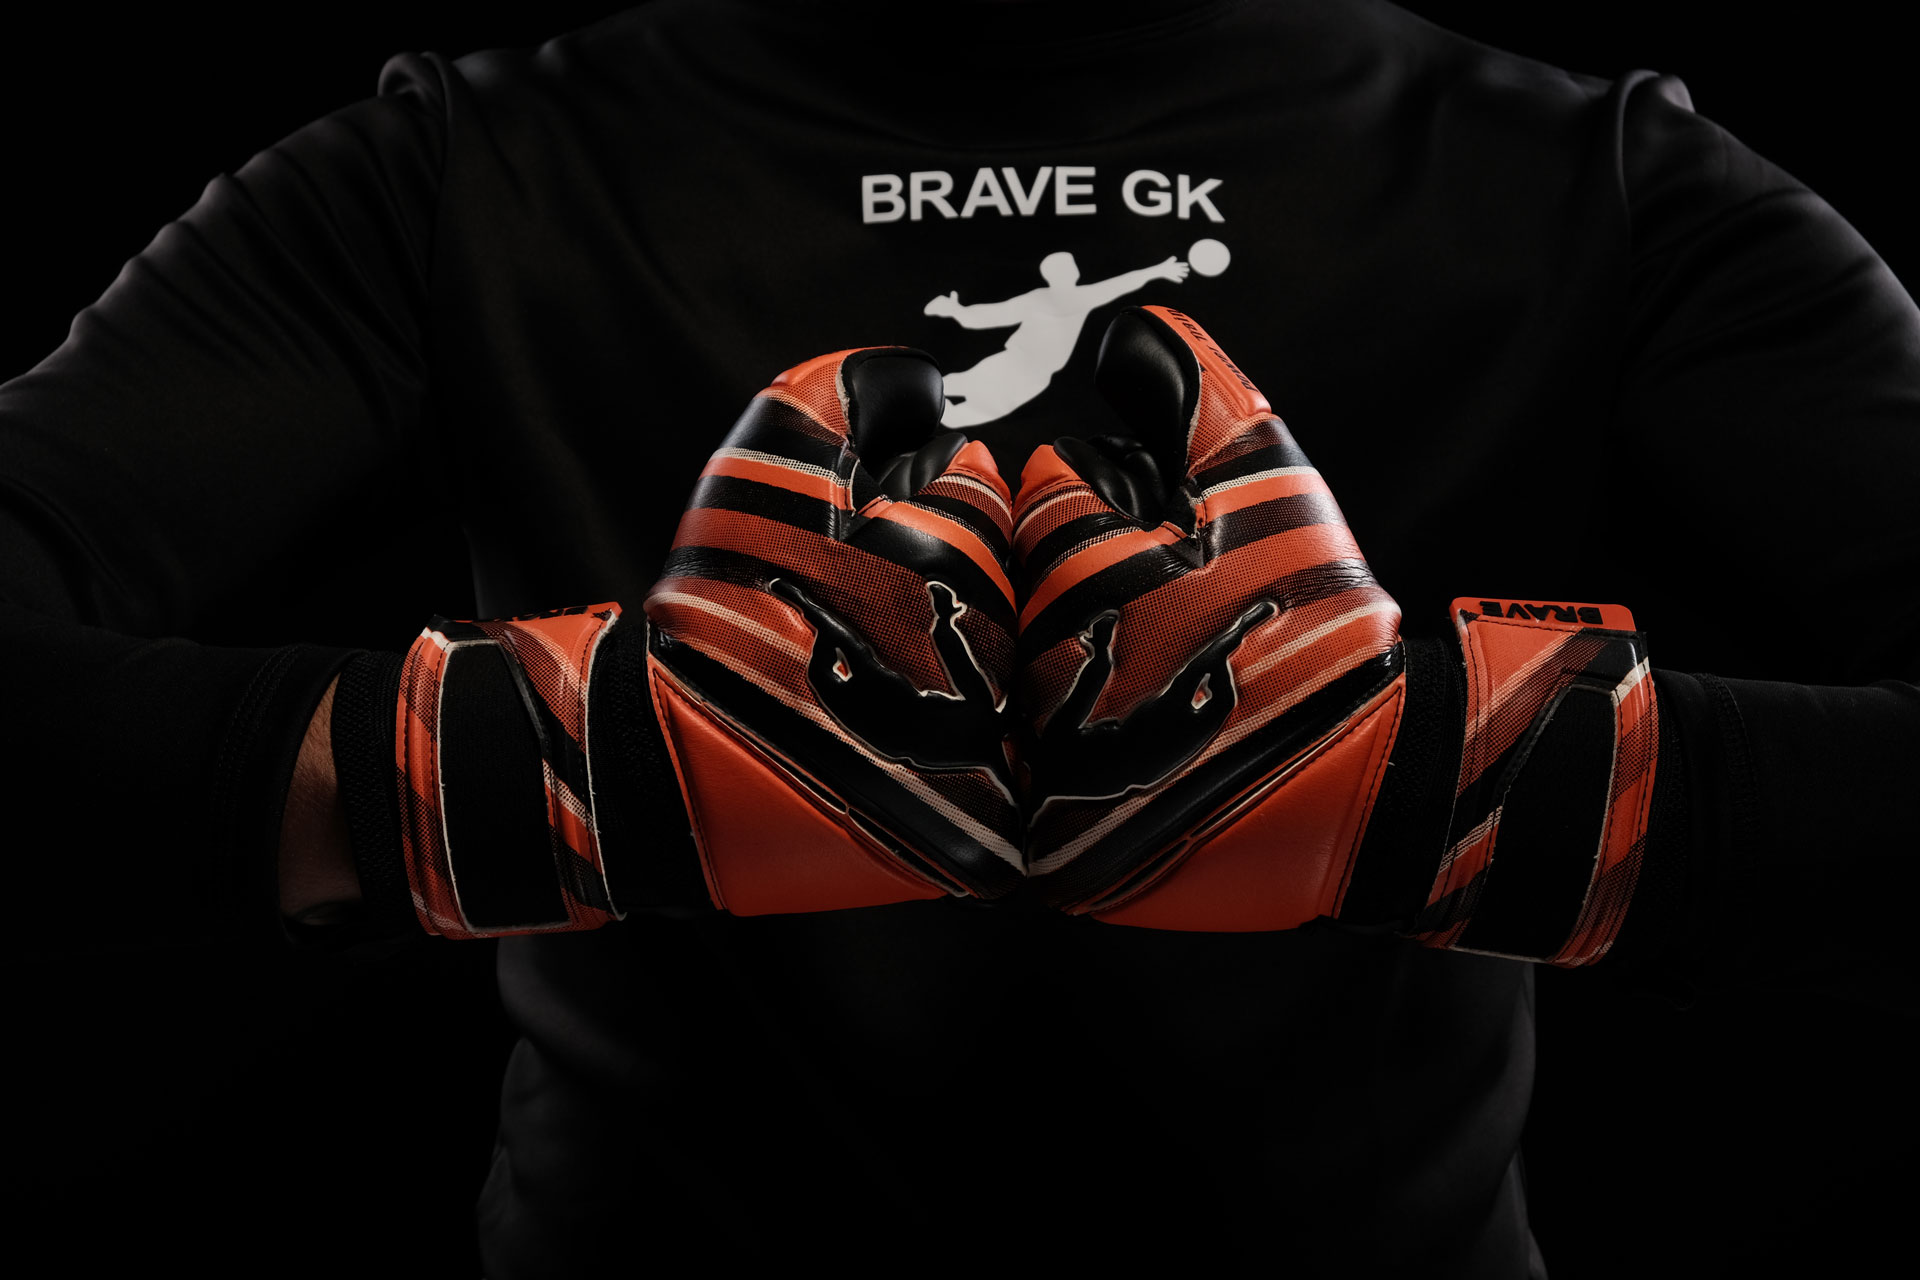 Воротарські рукавиці Brave GK Power Train-офіційний інтернет-магазин Brave GK